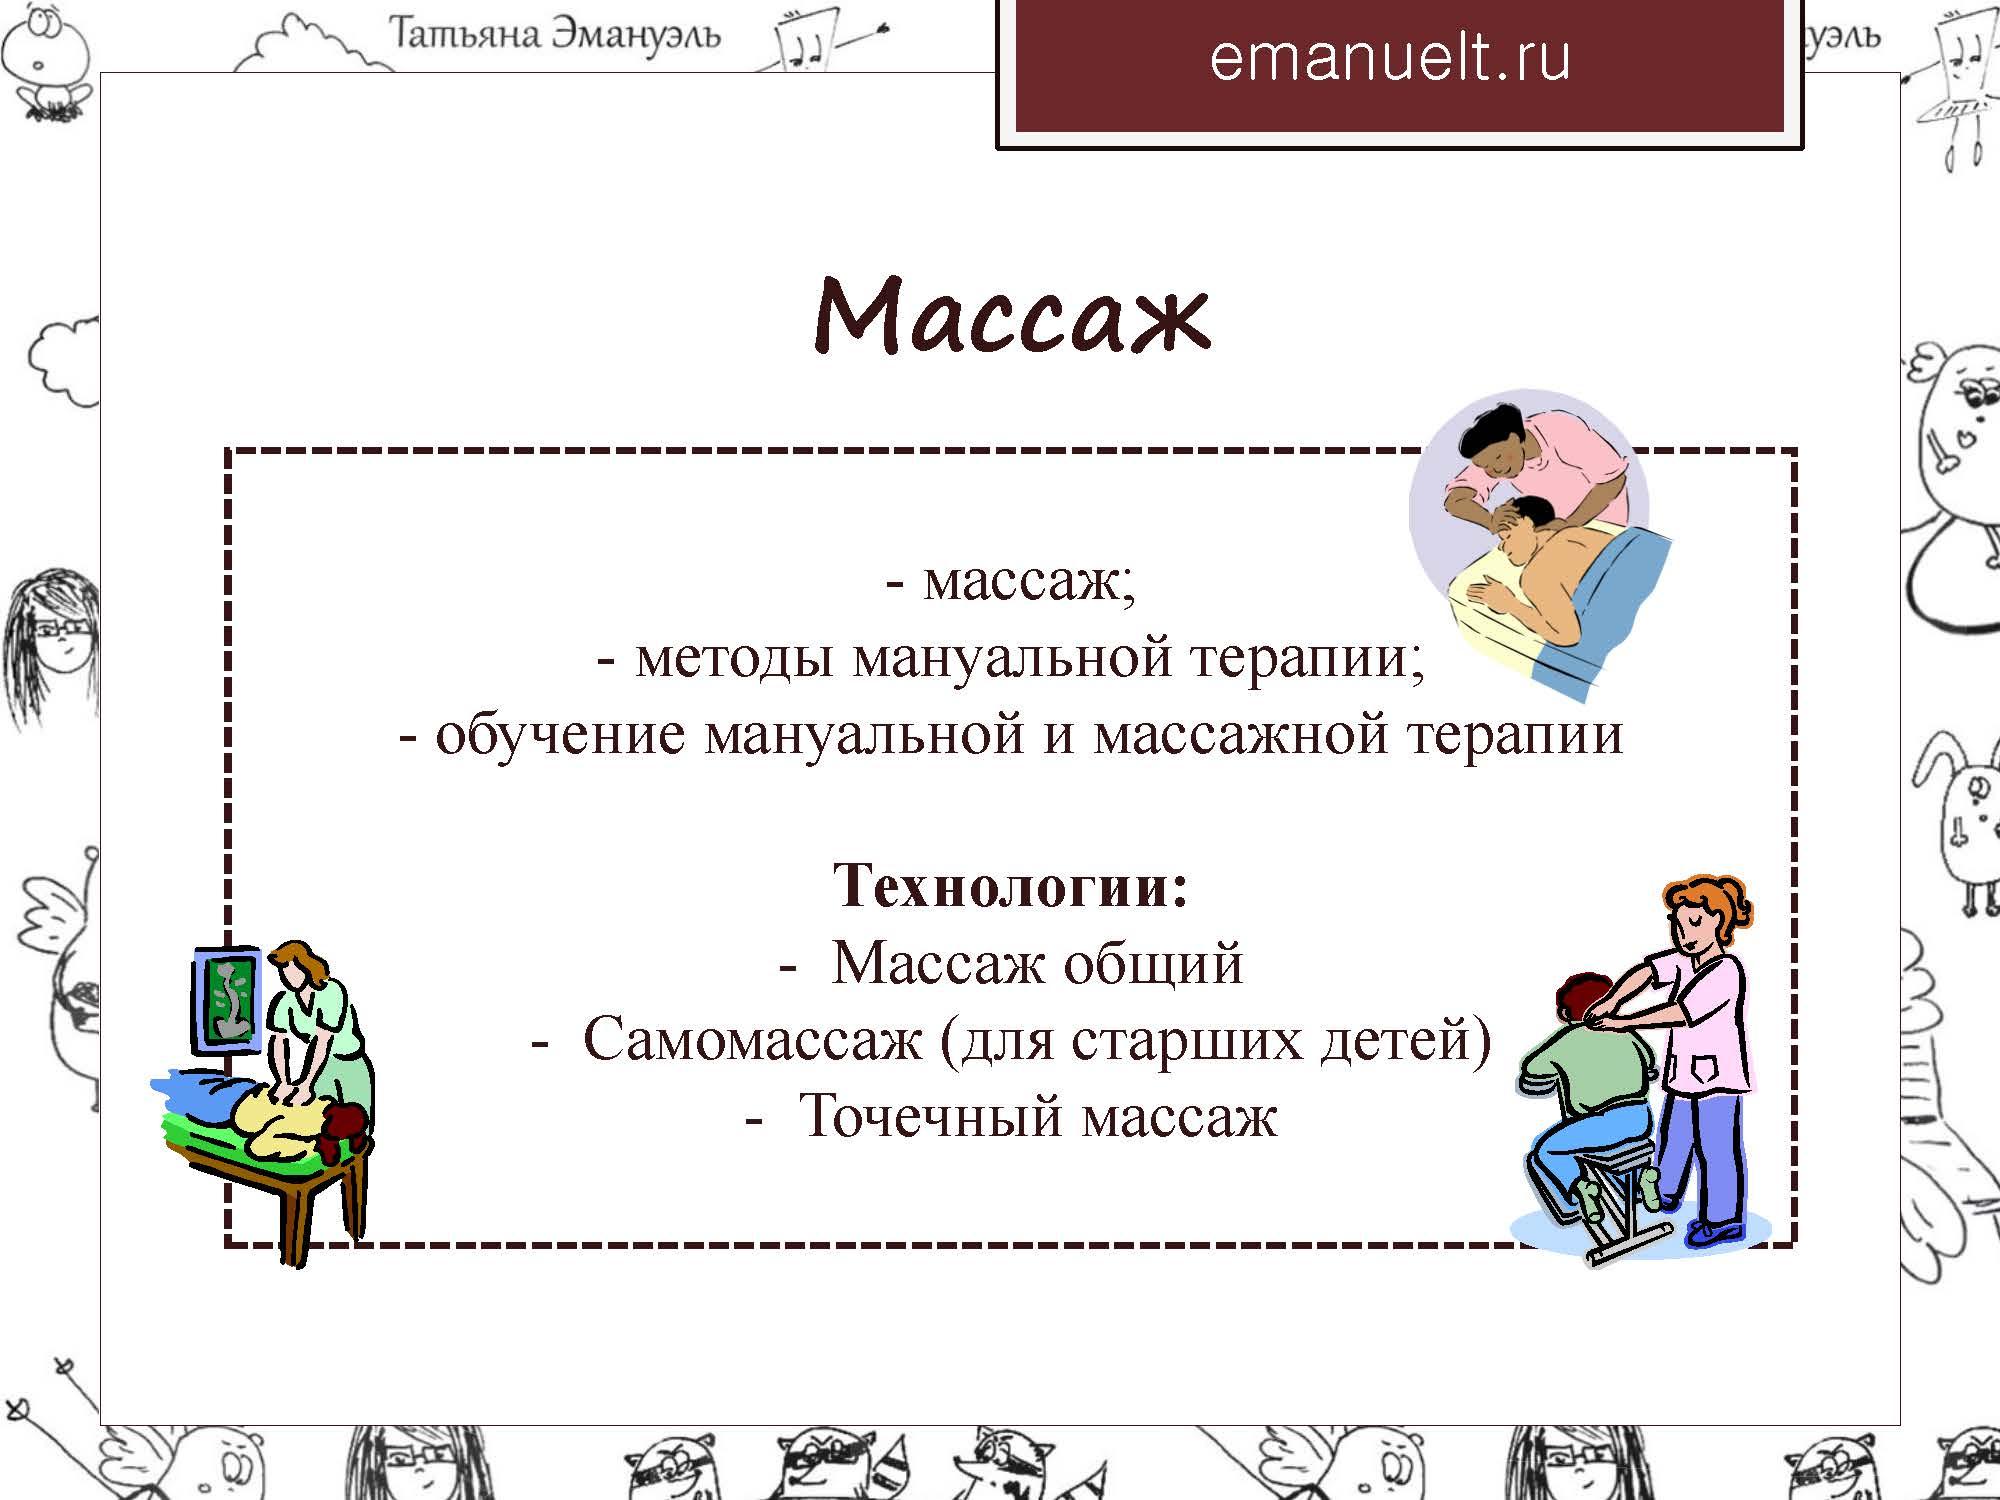 06 февраля эмануэль_Страница_071